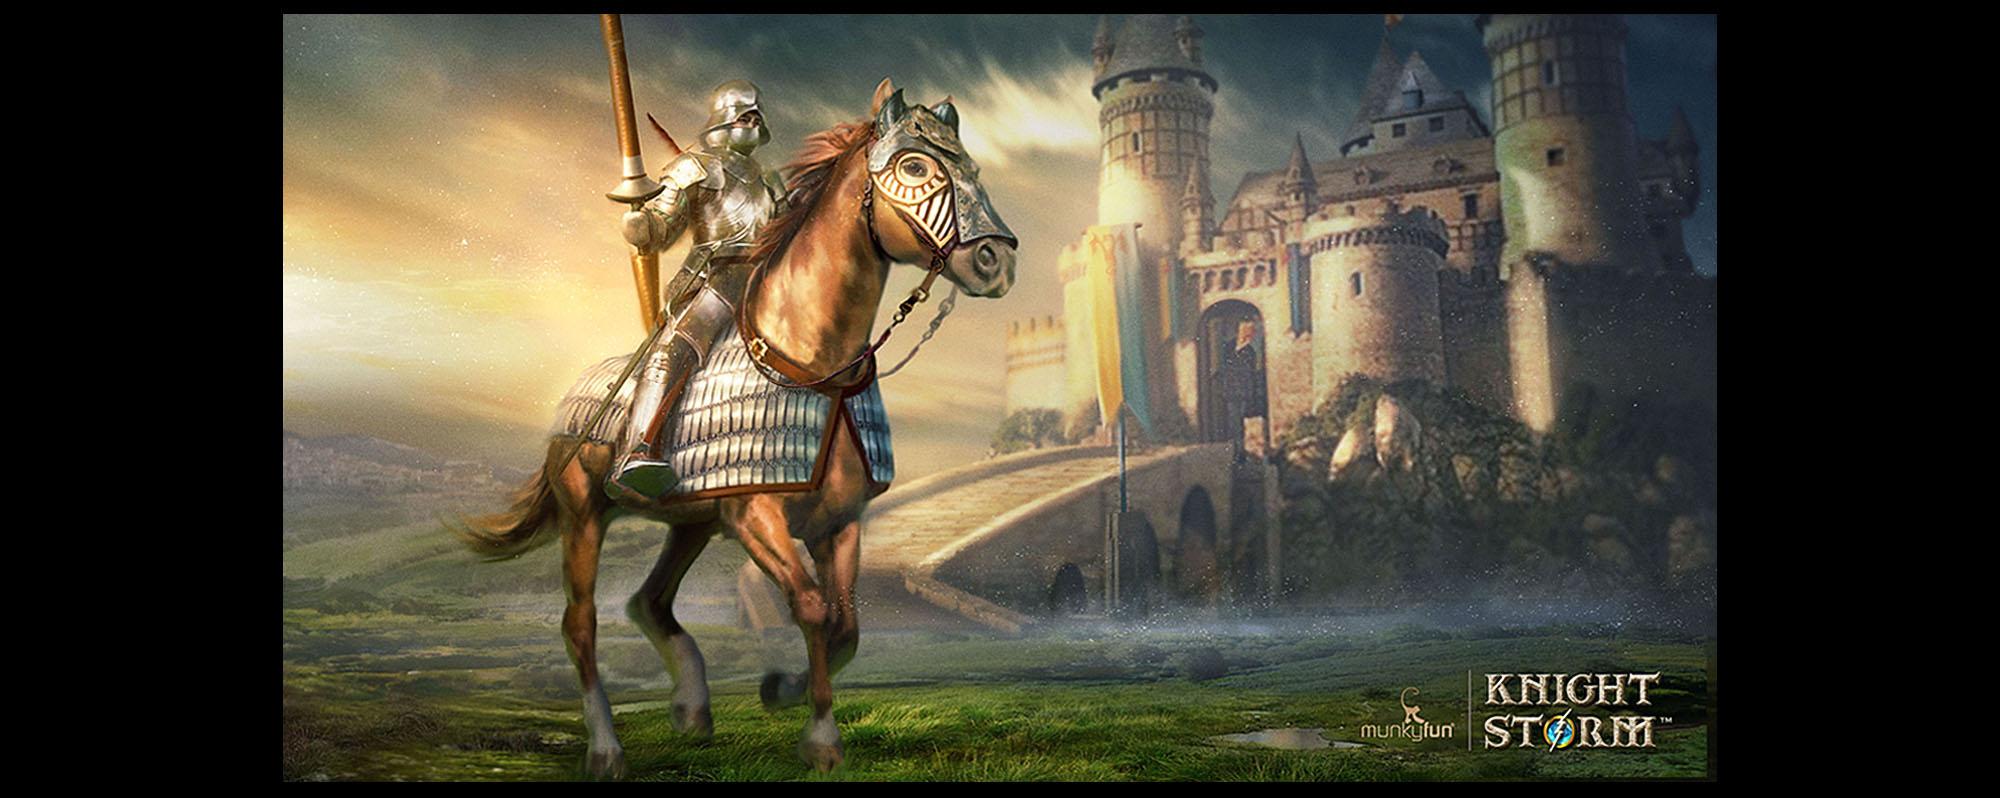 KnightStorm.jpg